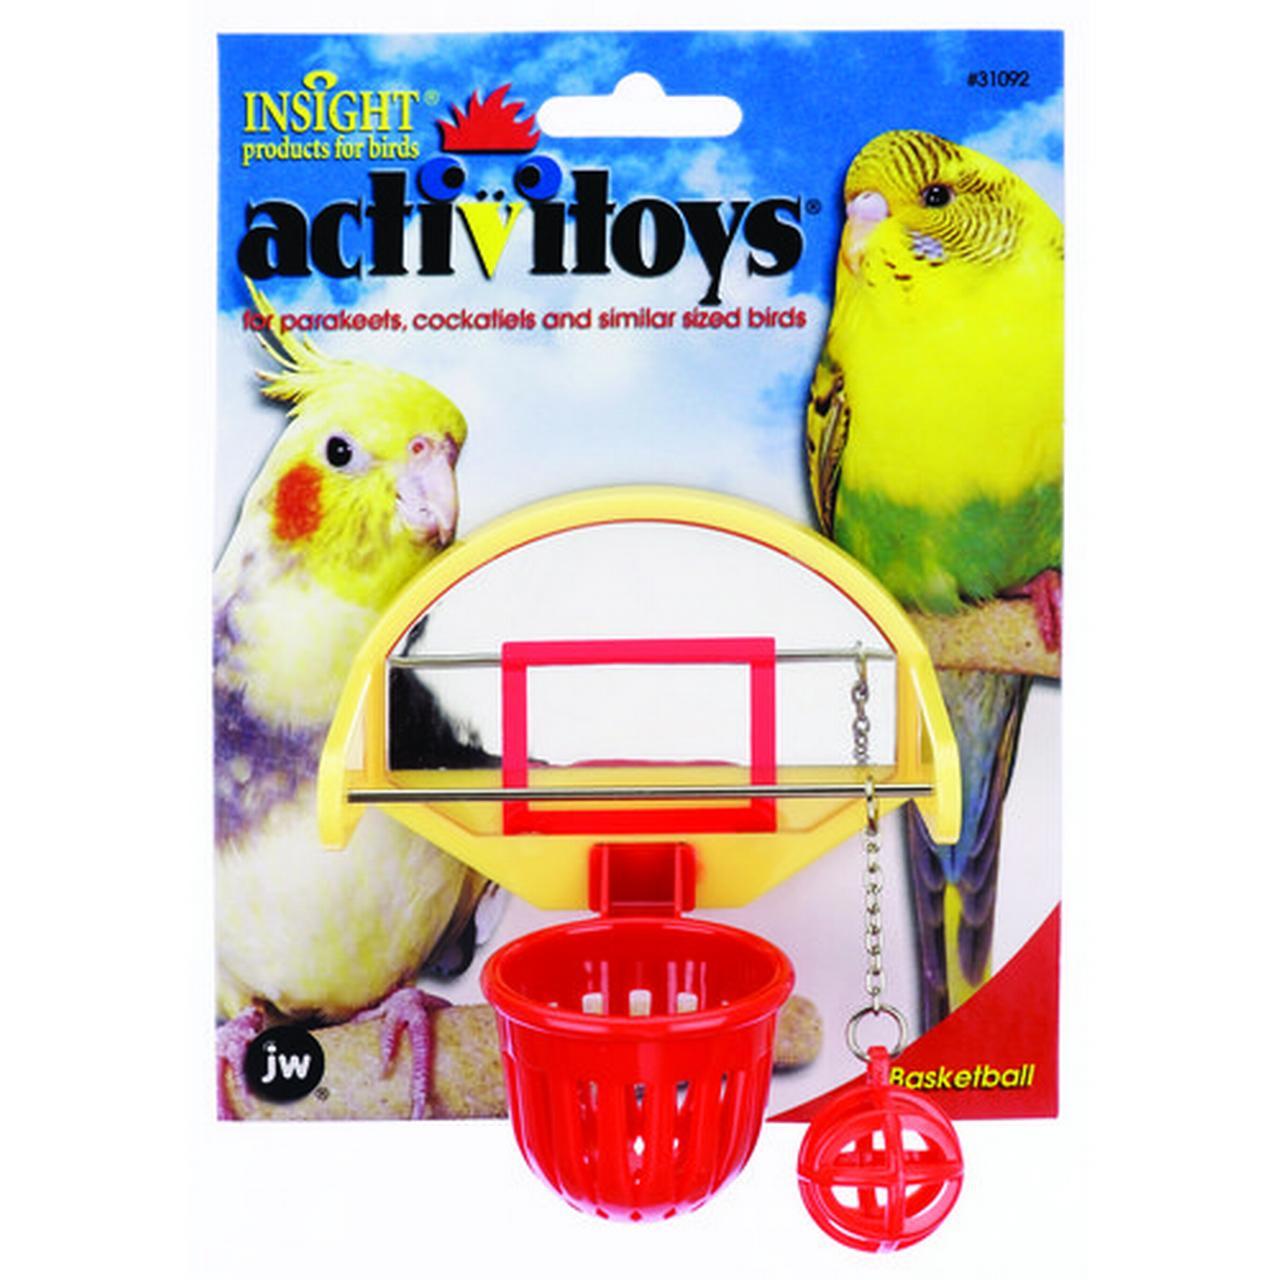 Insight 31092 Birdie Basketball Toy